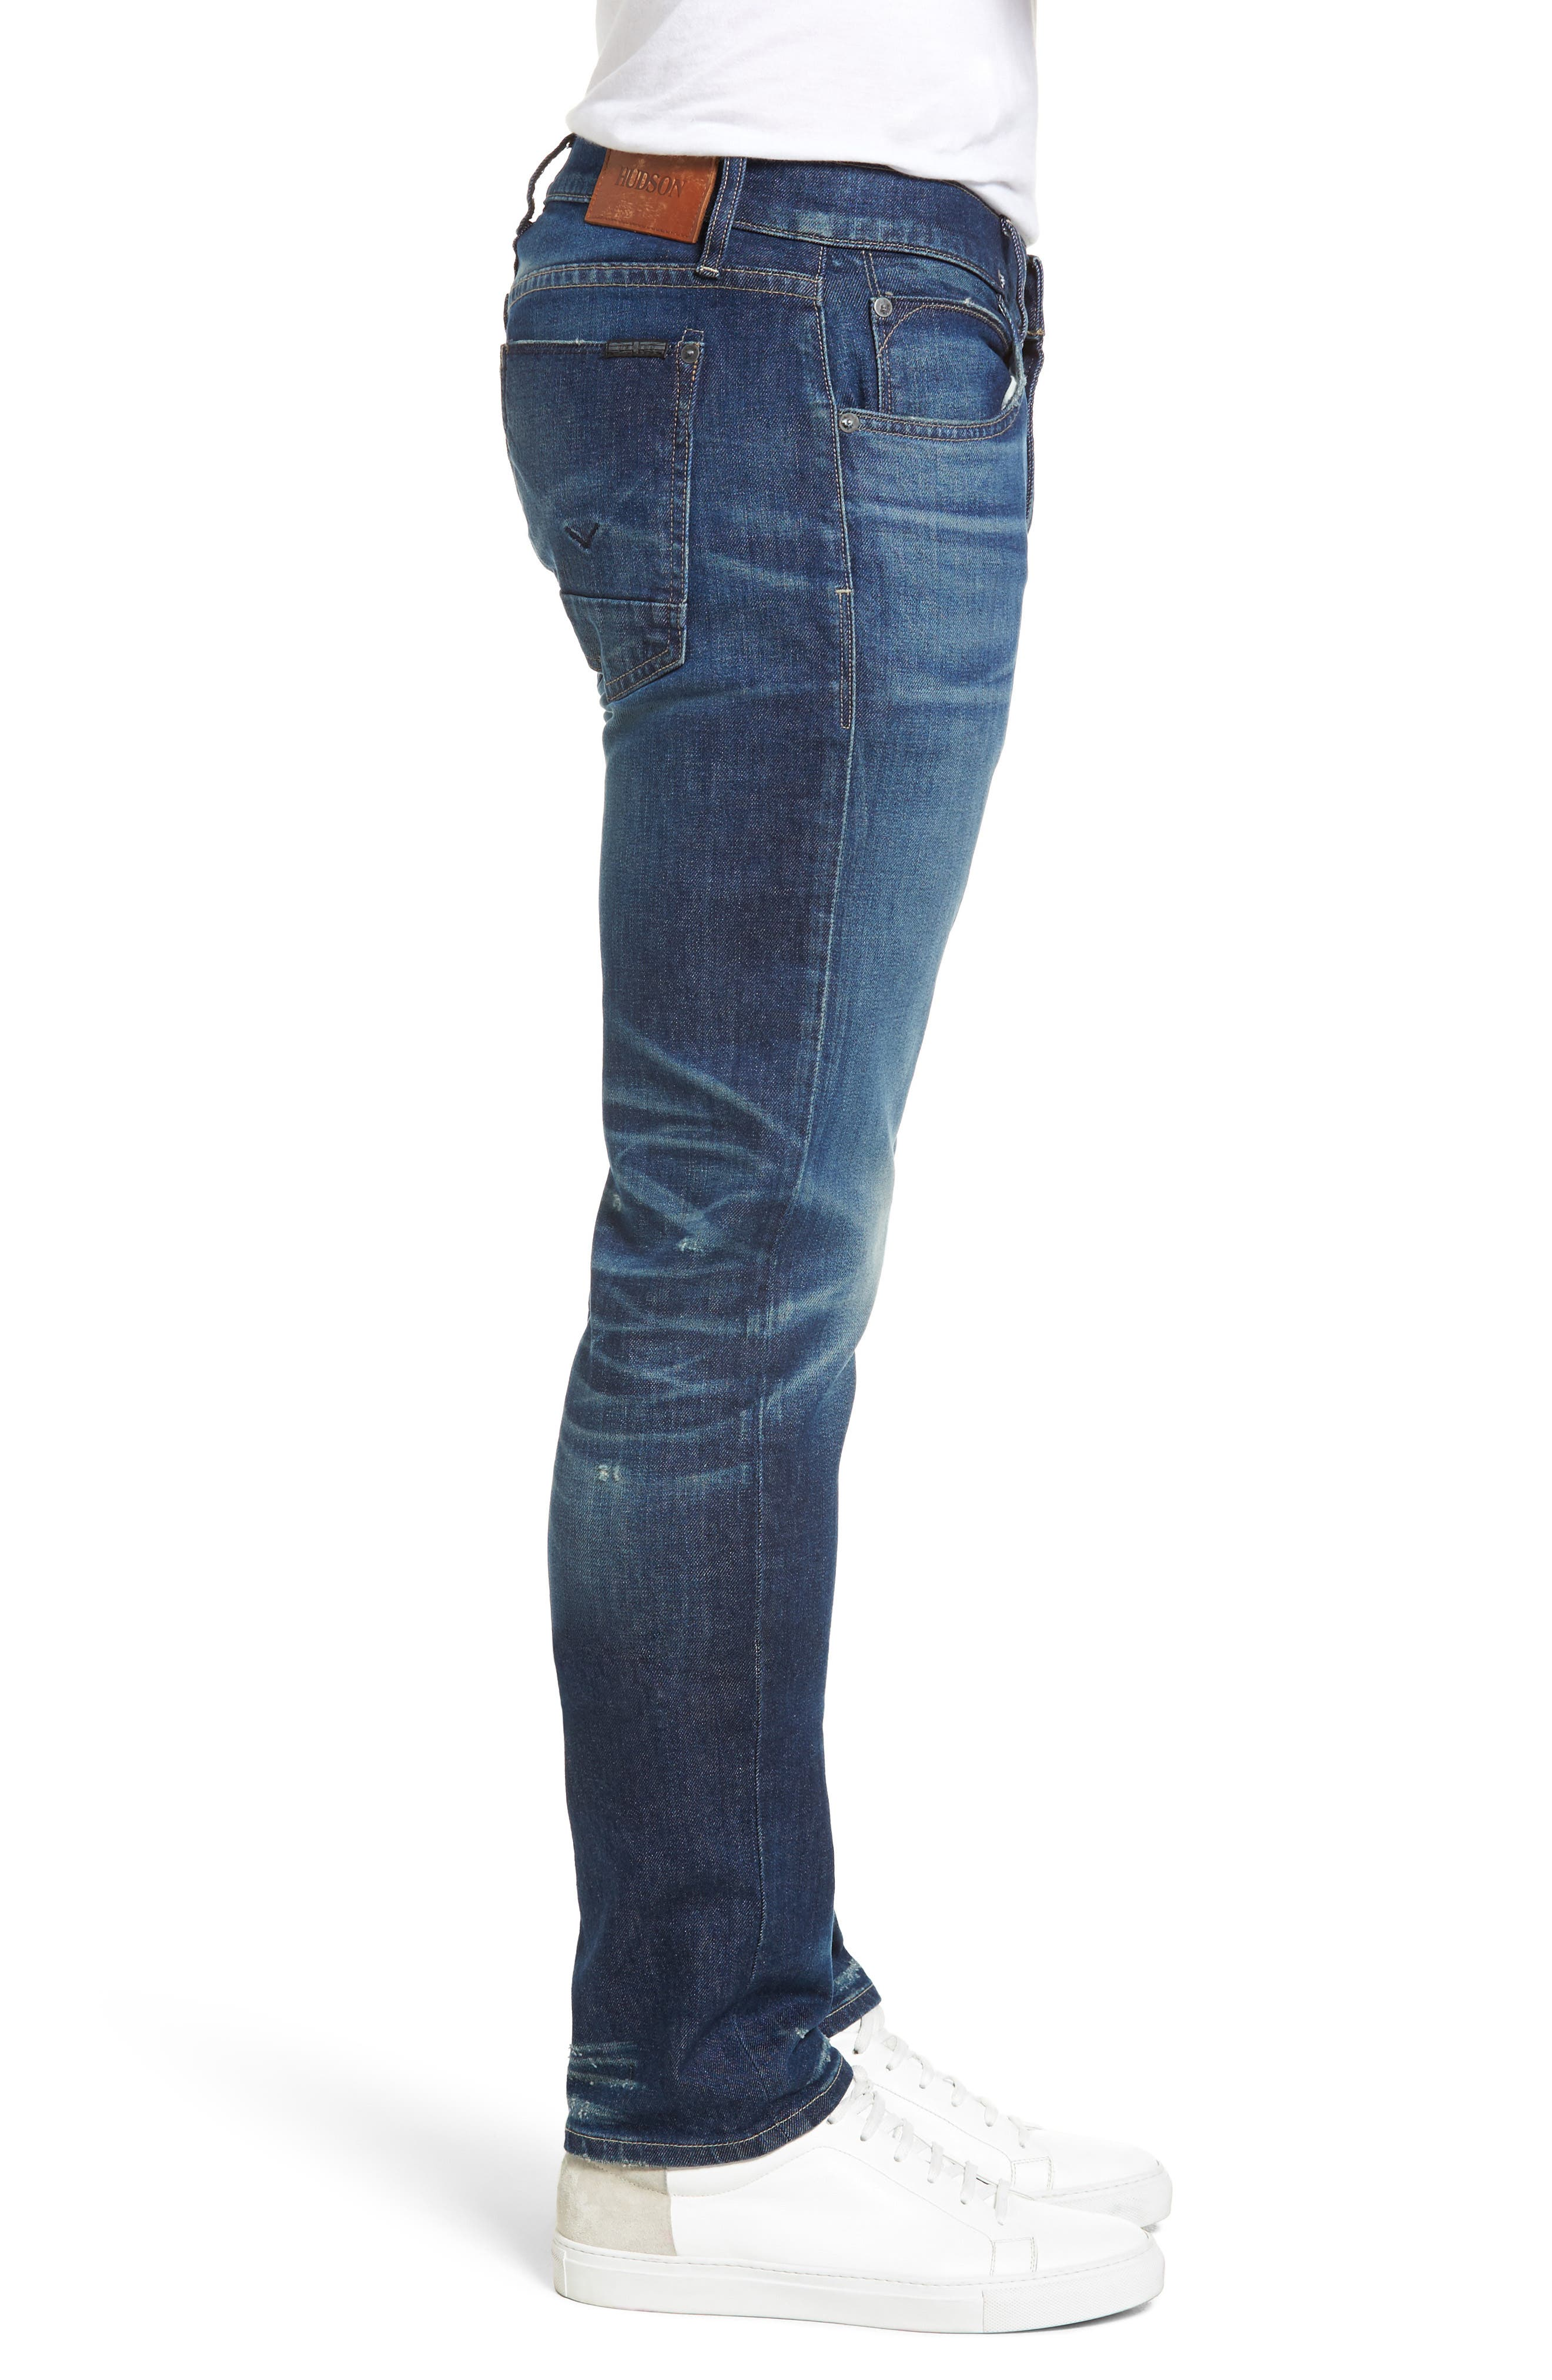 Blake Slim Fit Jeans,                             Alternate thumbnail 3, color,                             425